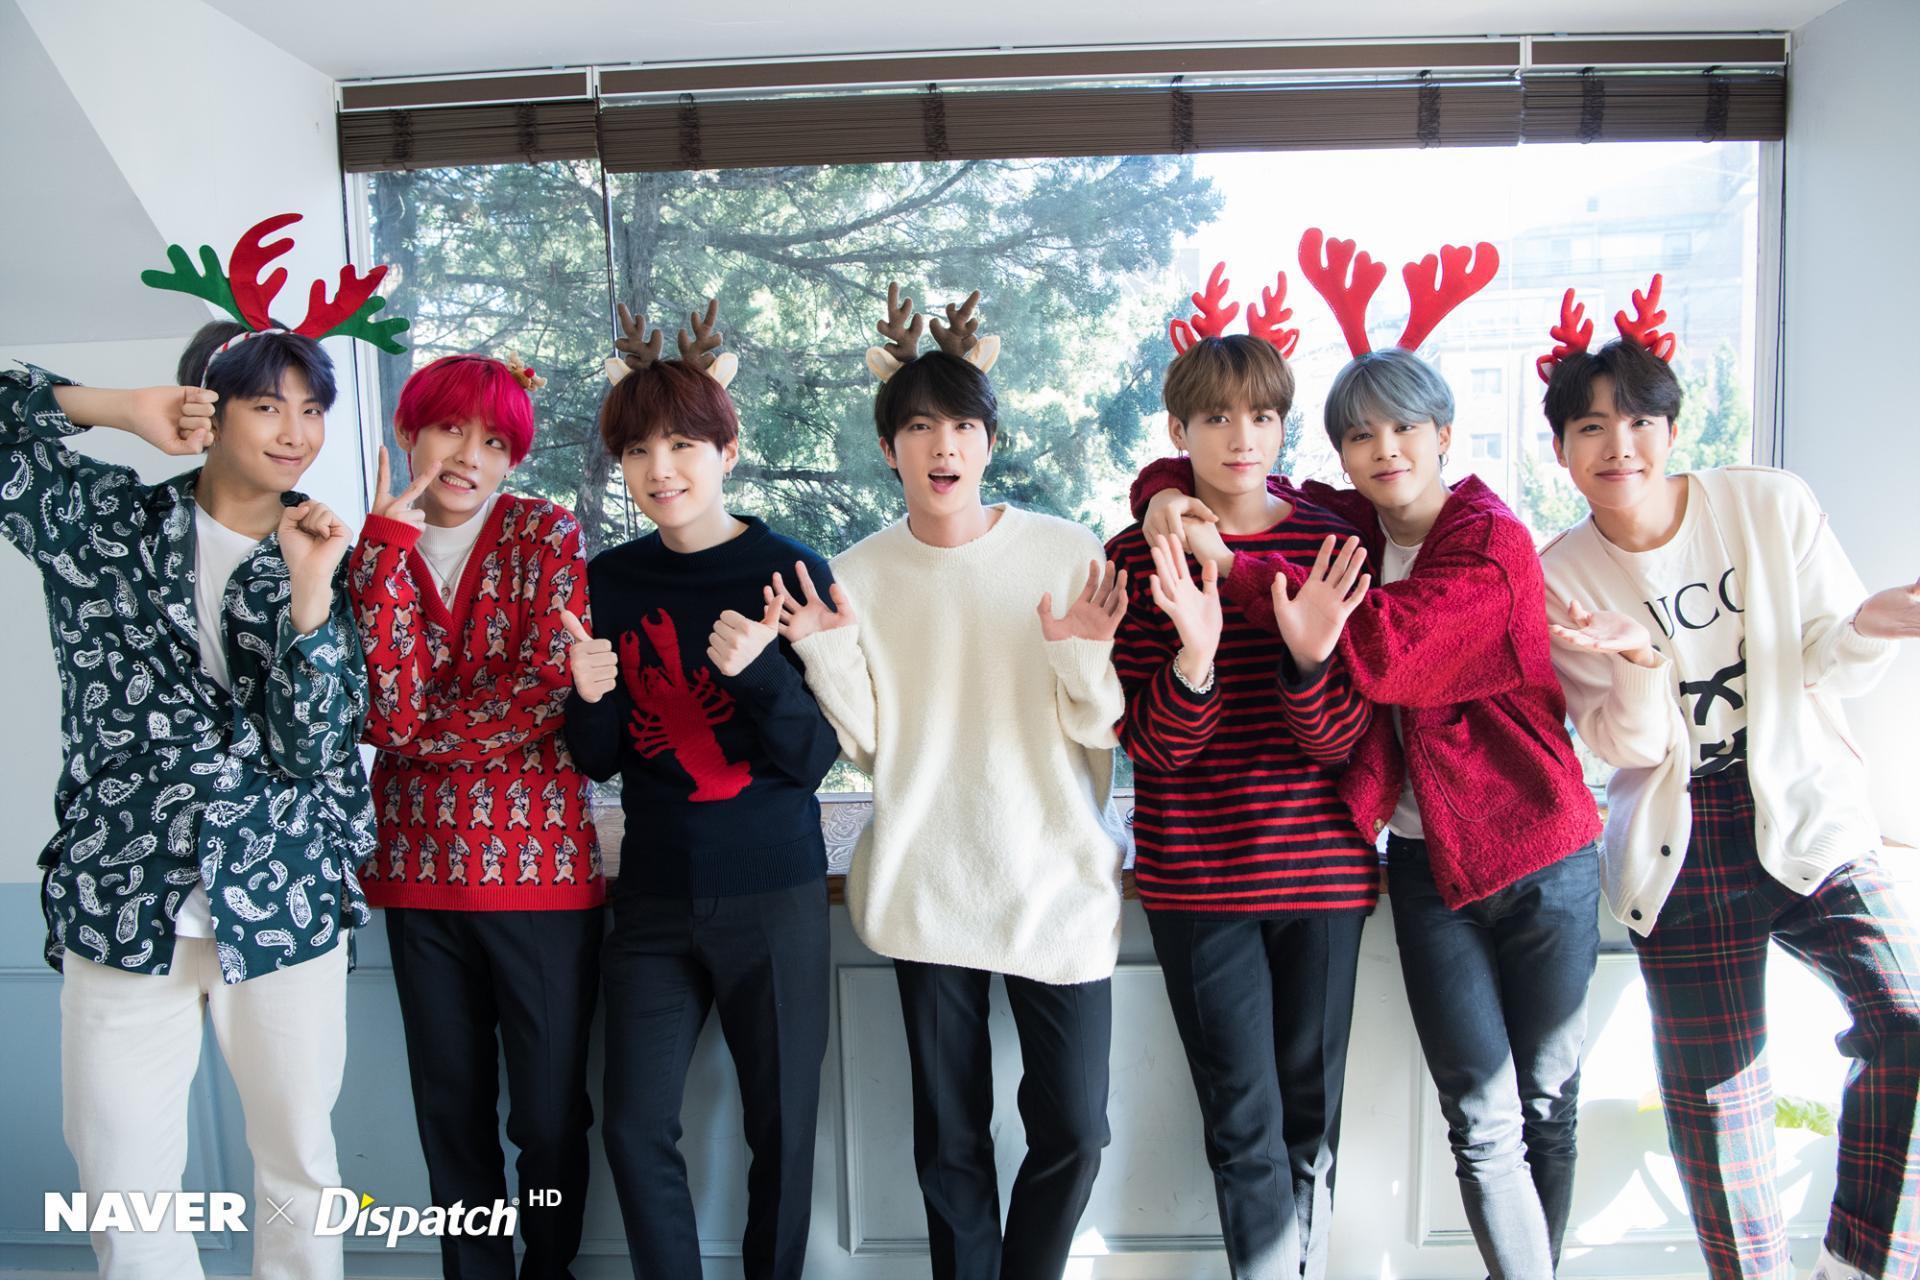 BTS Christmas Hd Wallpapers - Wallpaper Cave